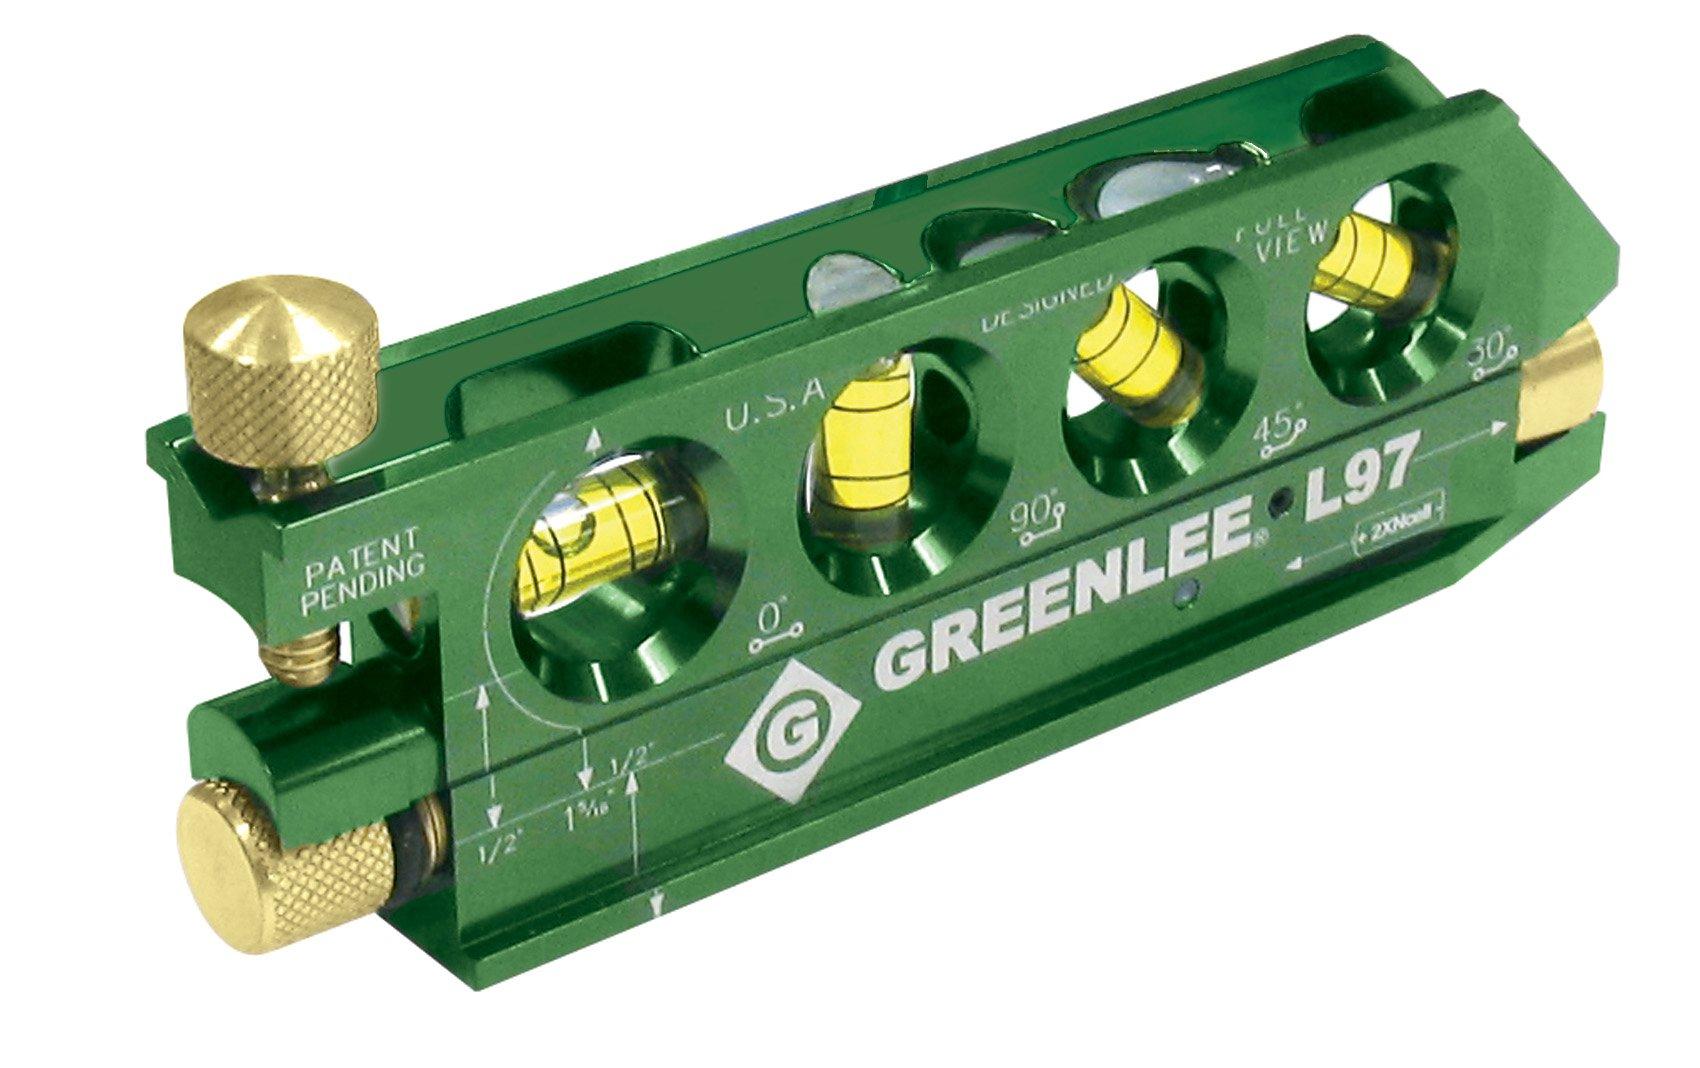 Greenlee L97 Mini Magnet Laser Level by Greenlee